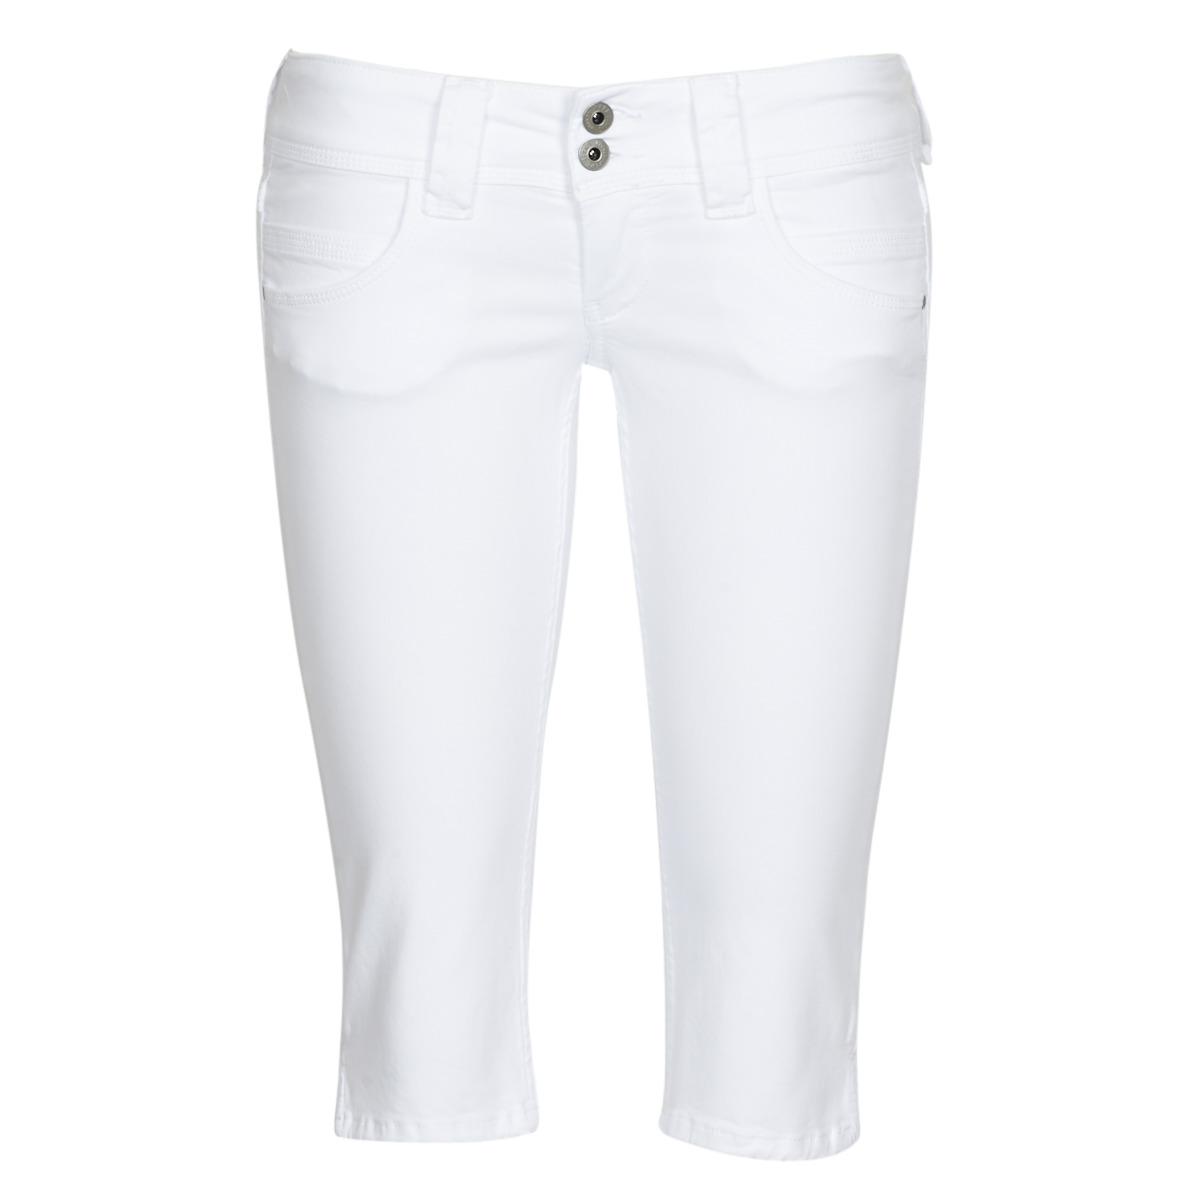 Pepe Jeans Pantaloncini Donna